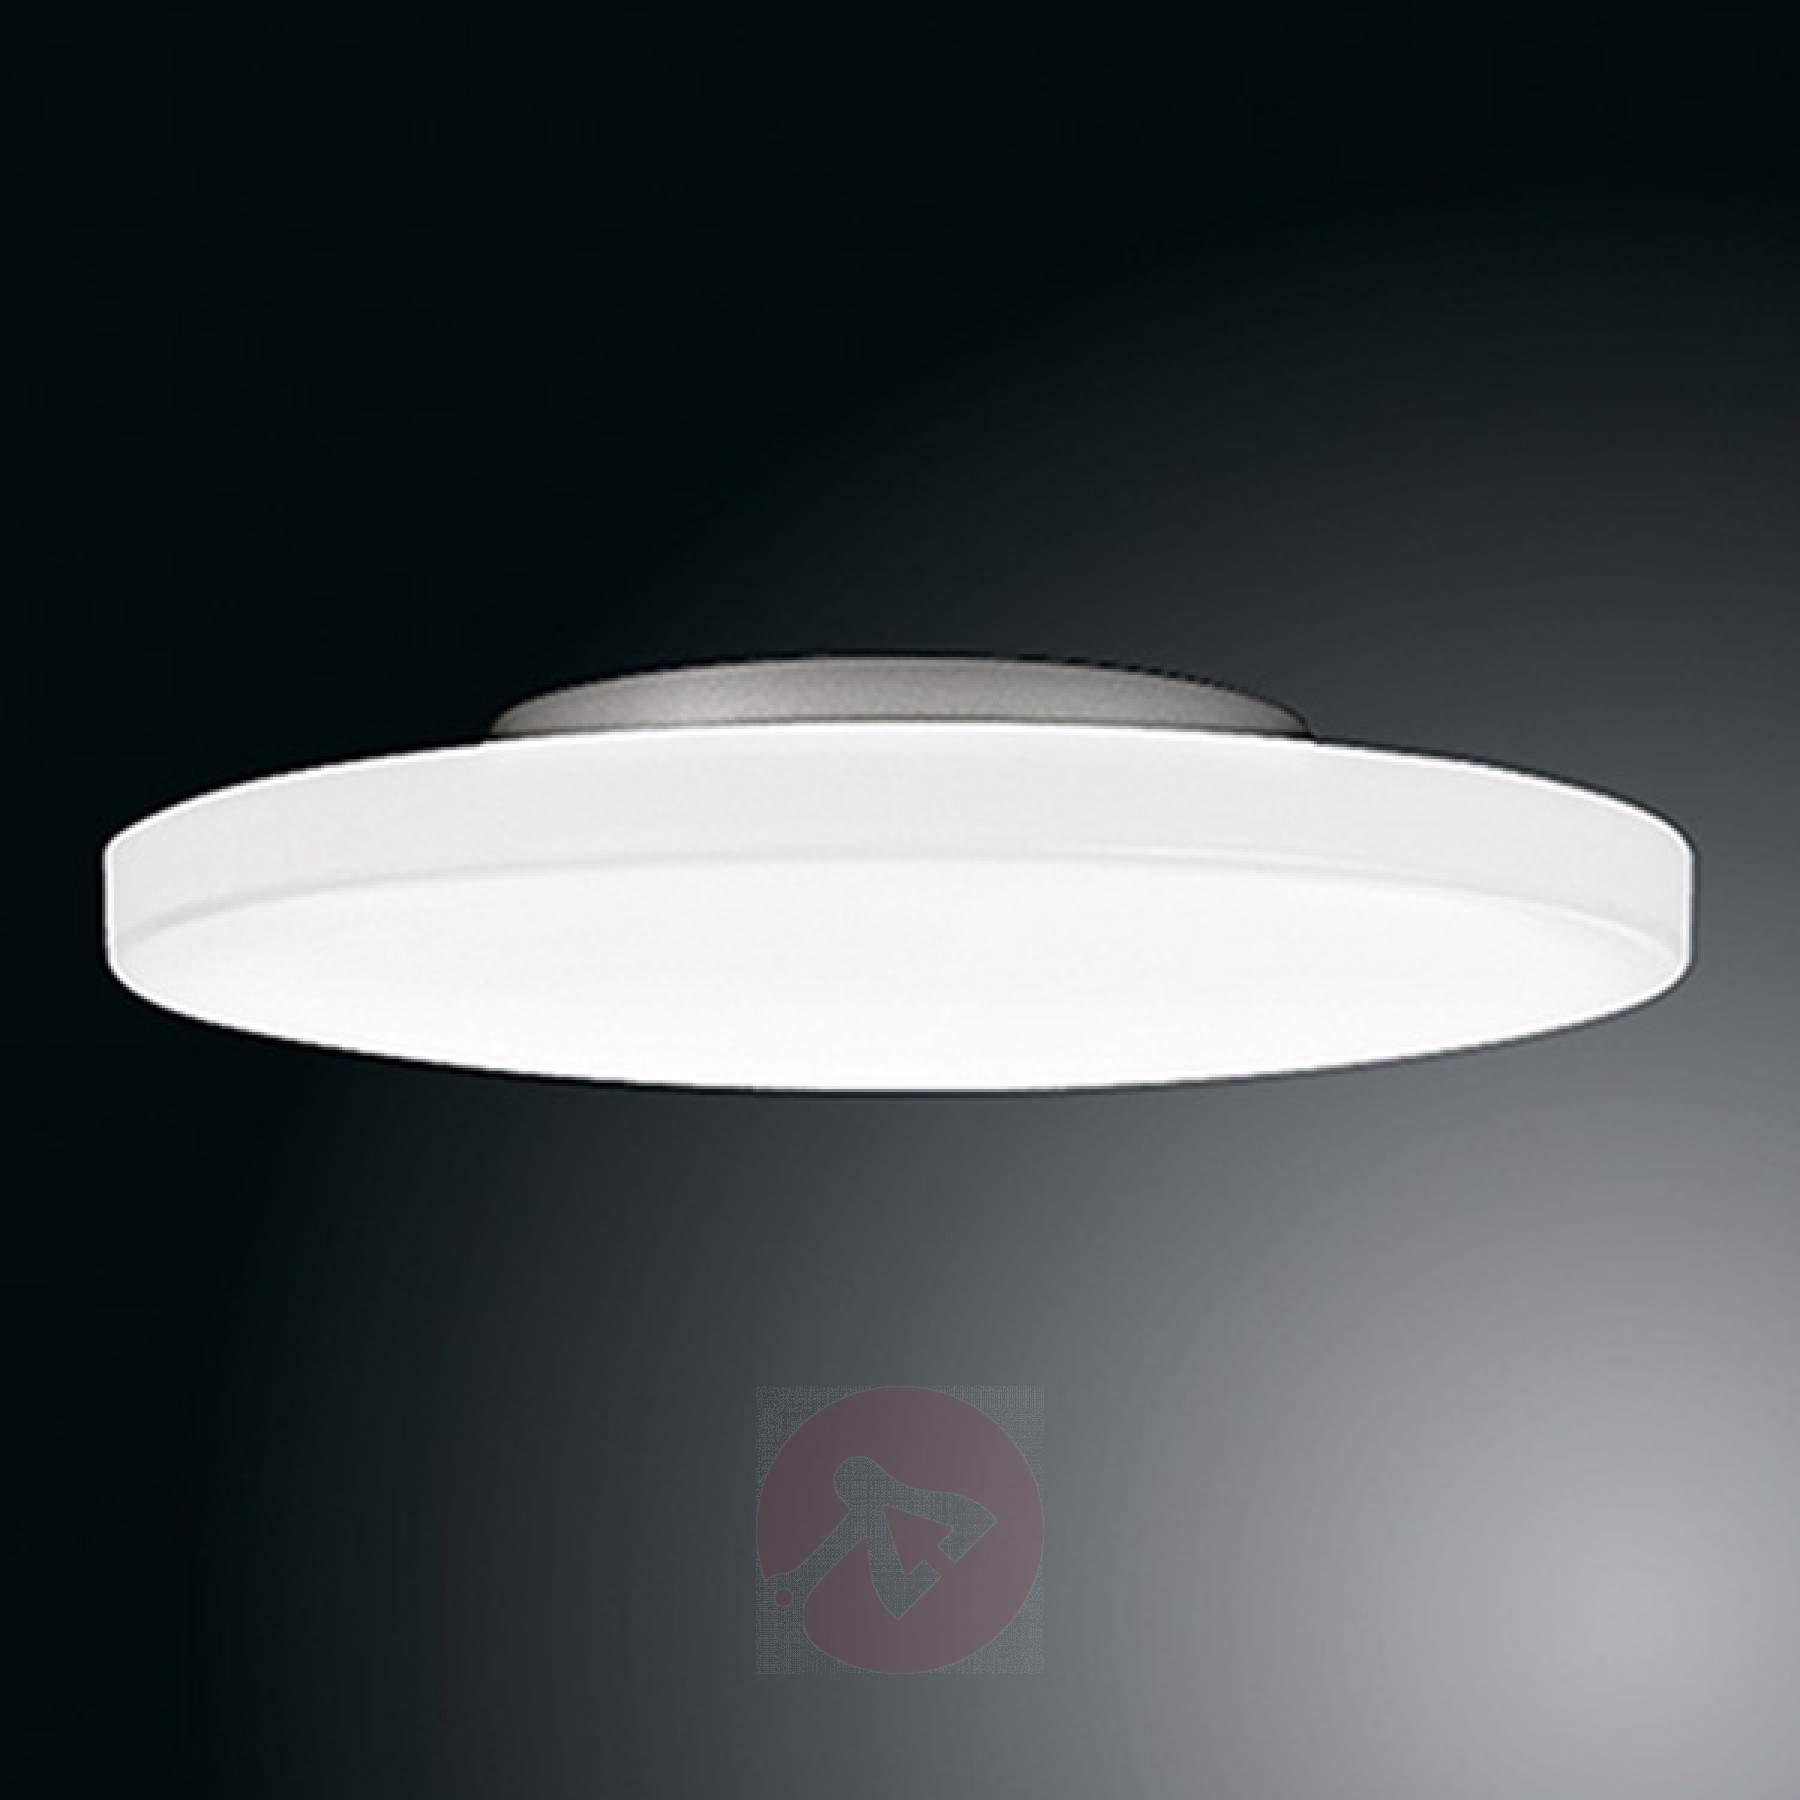 Deckenlampe Led Dimmbar